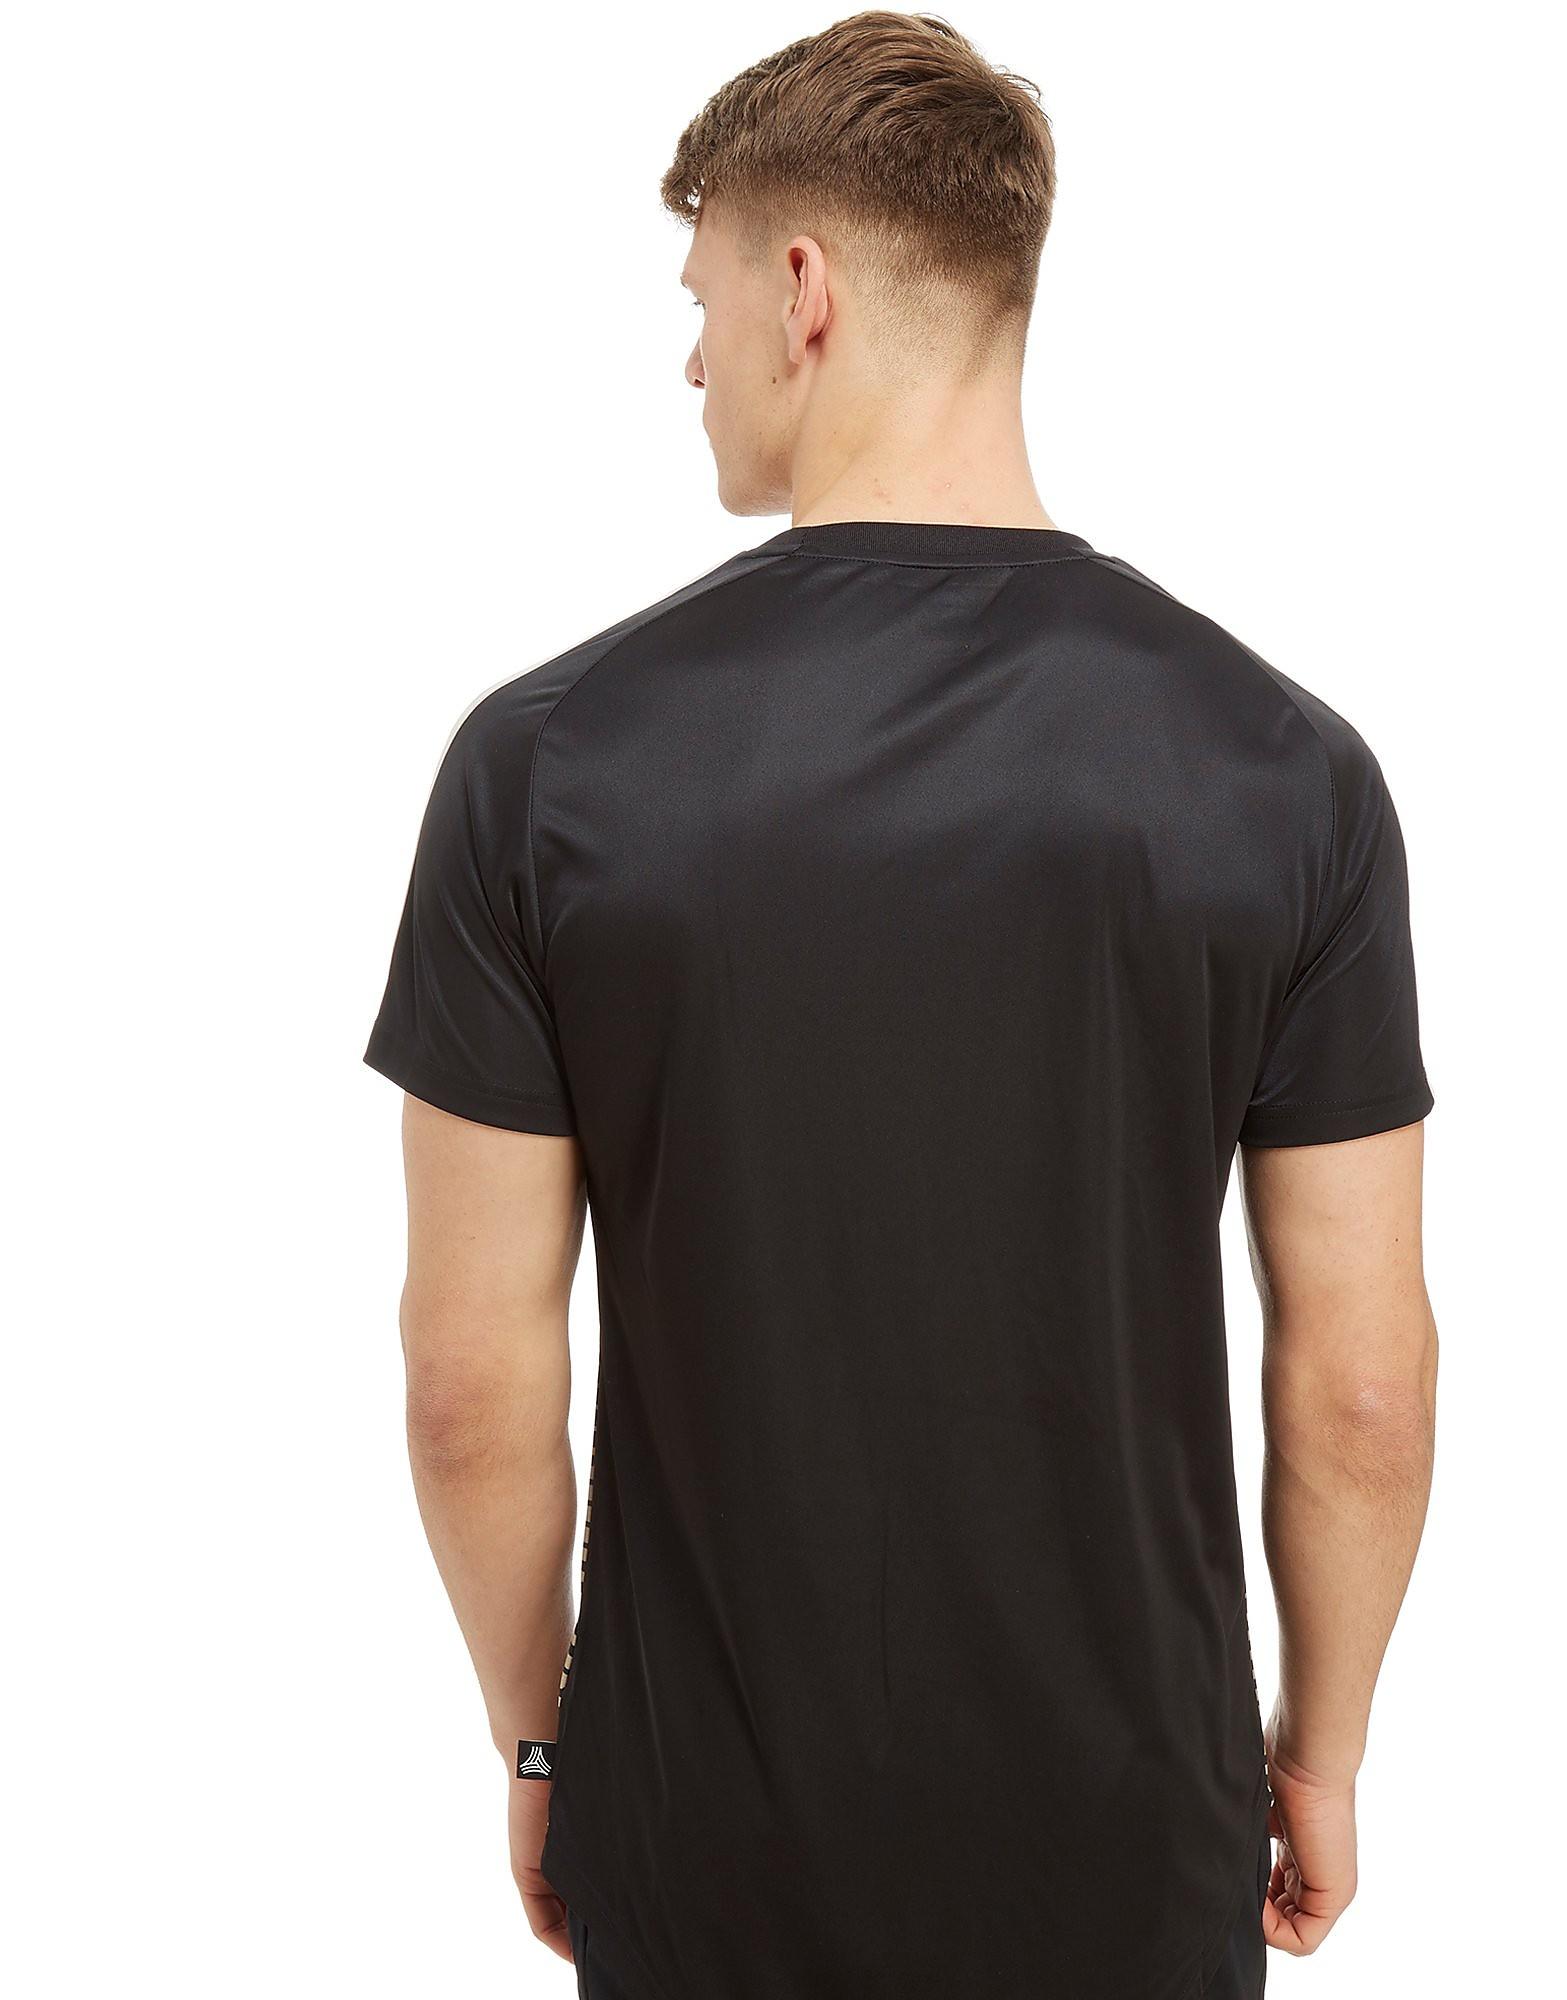 adidas Tango Graphic T-Shirt